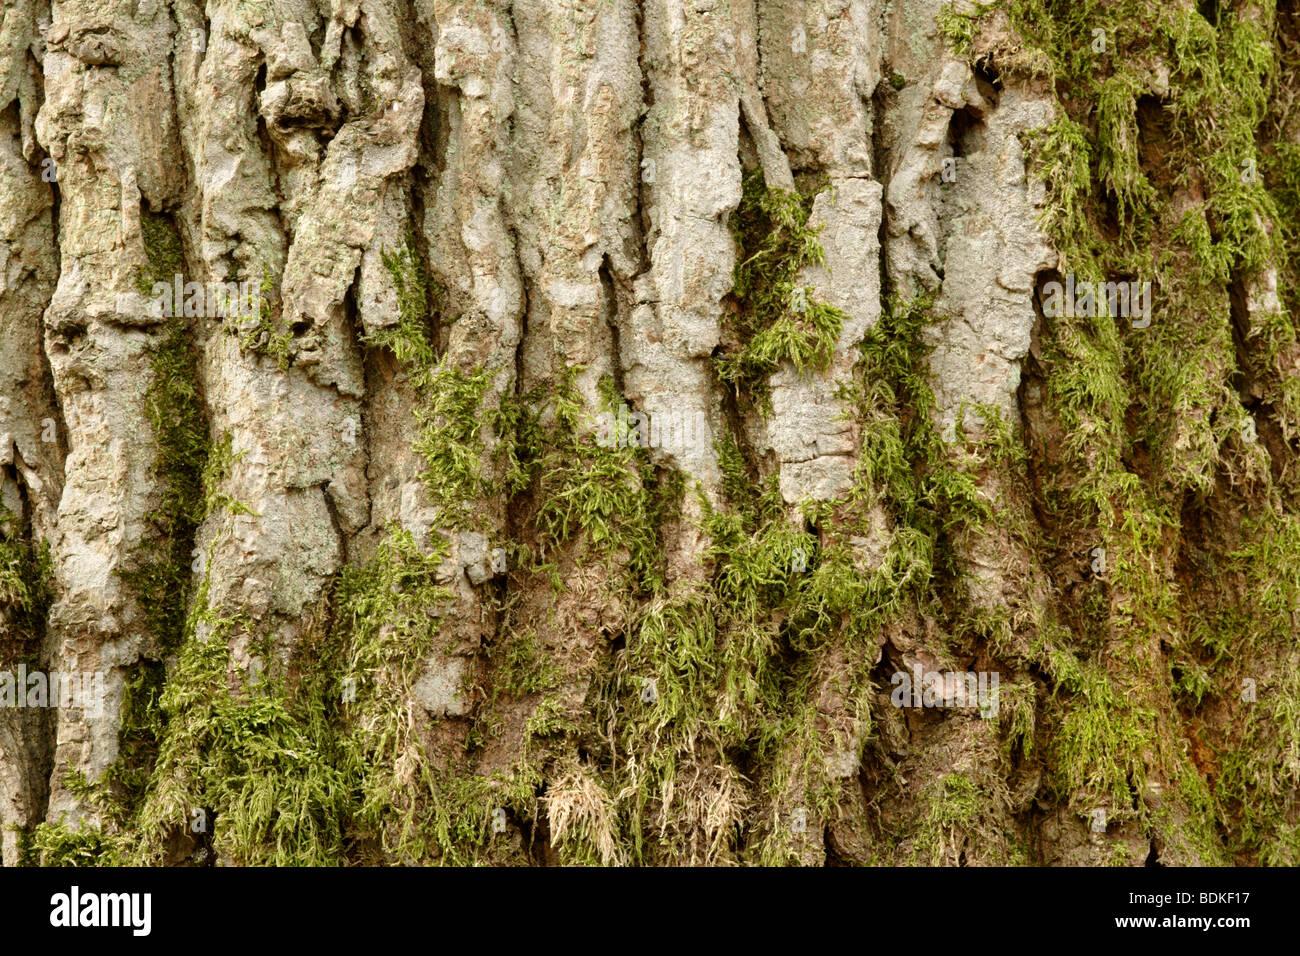 Moss growing on Oak tree (Quercus robur) bark - Stock Image